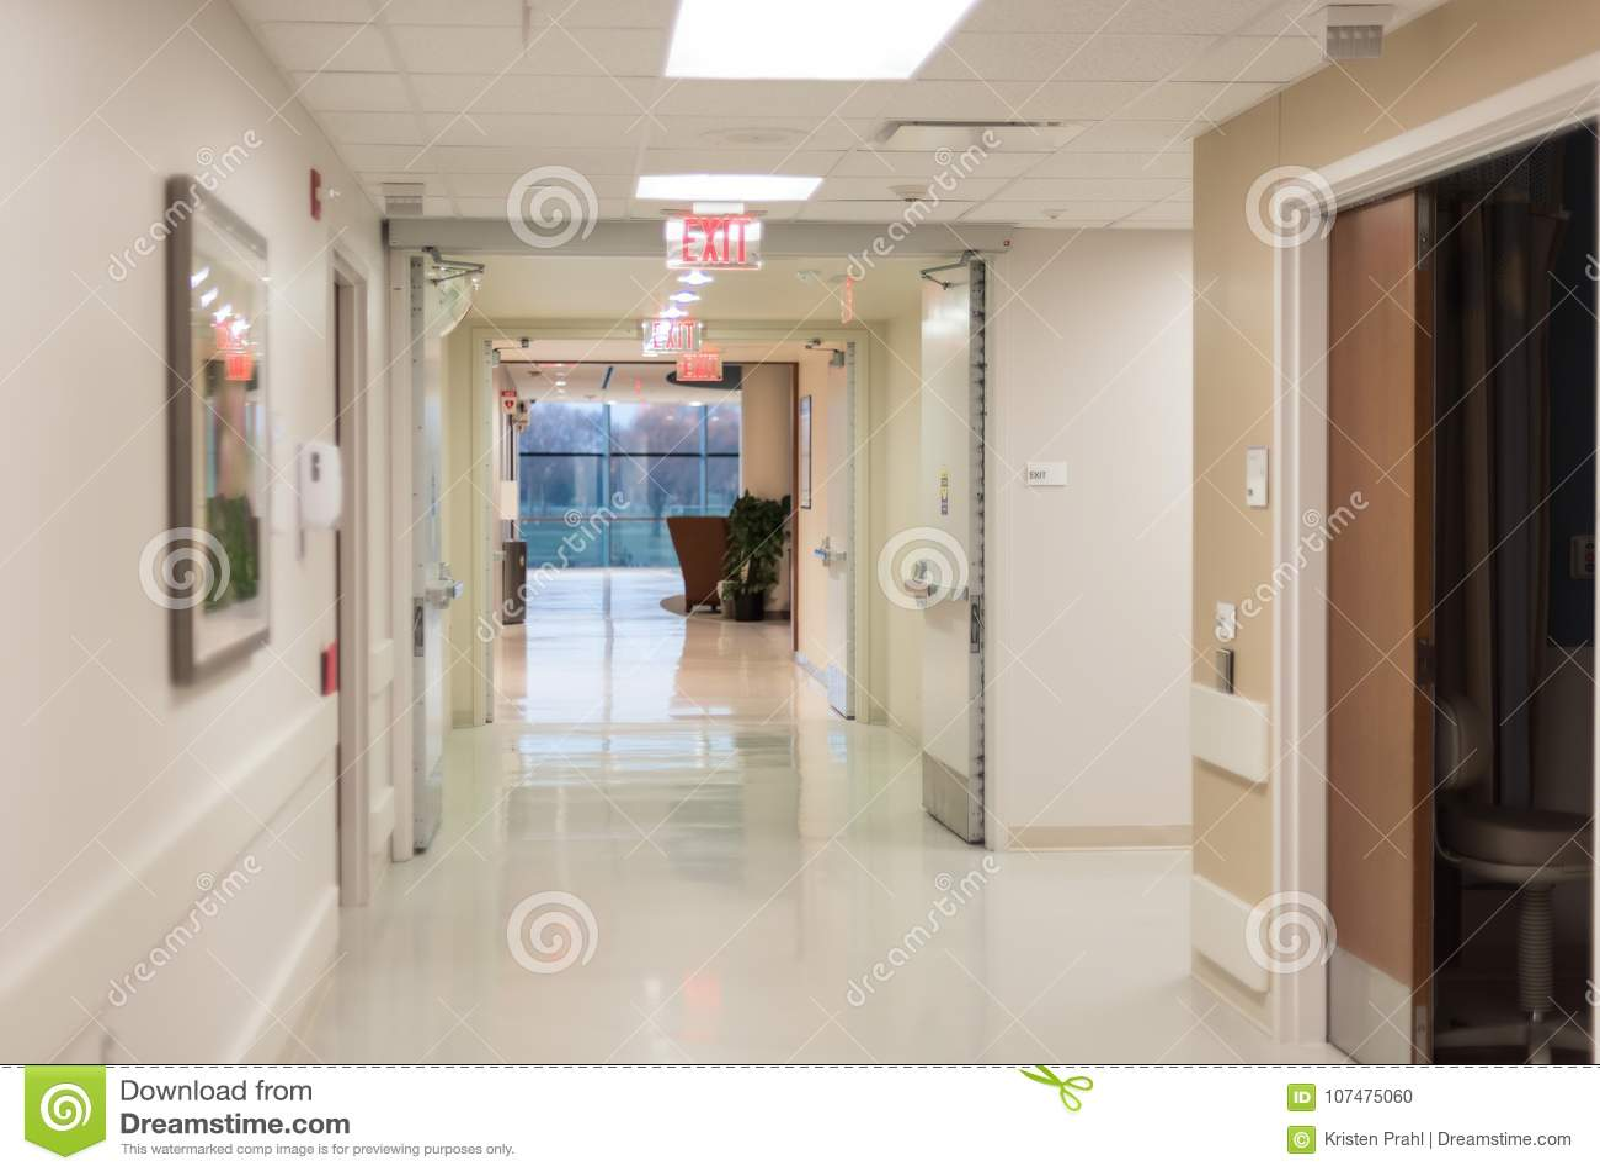 Hospital hallway with bright flourescent lights